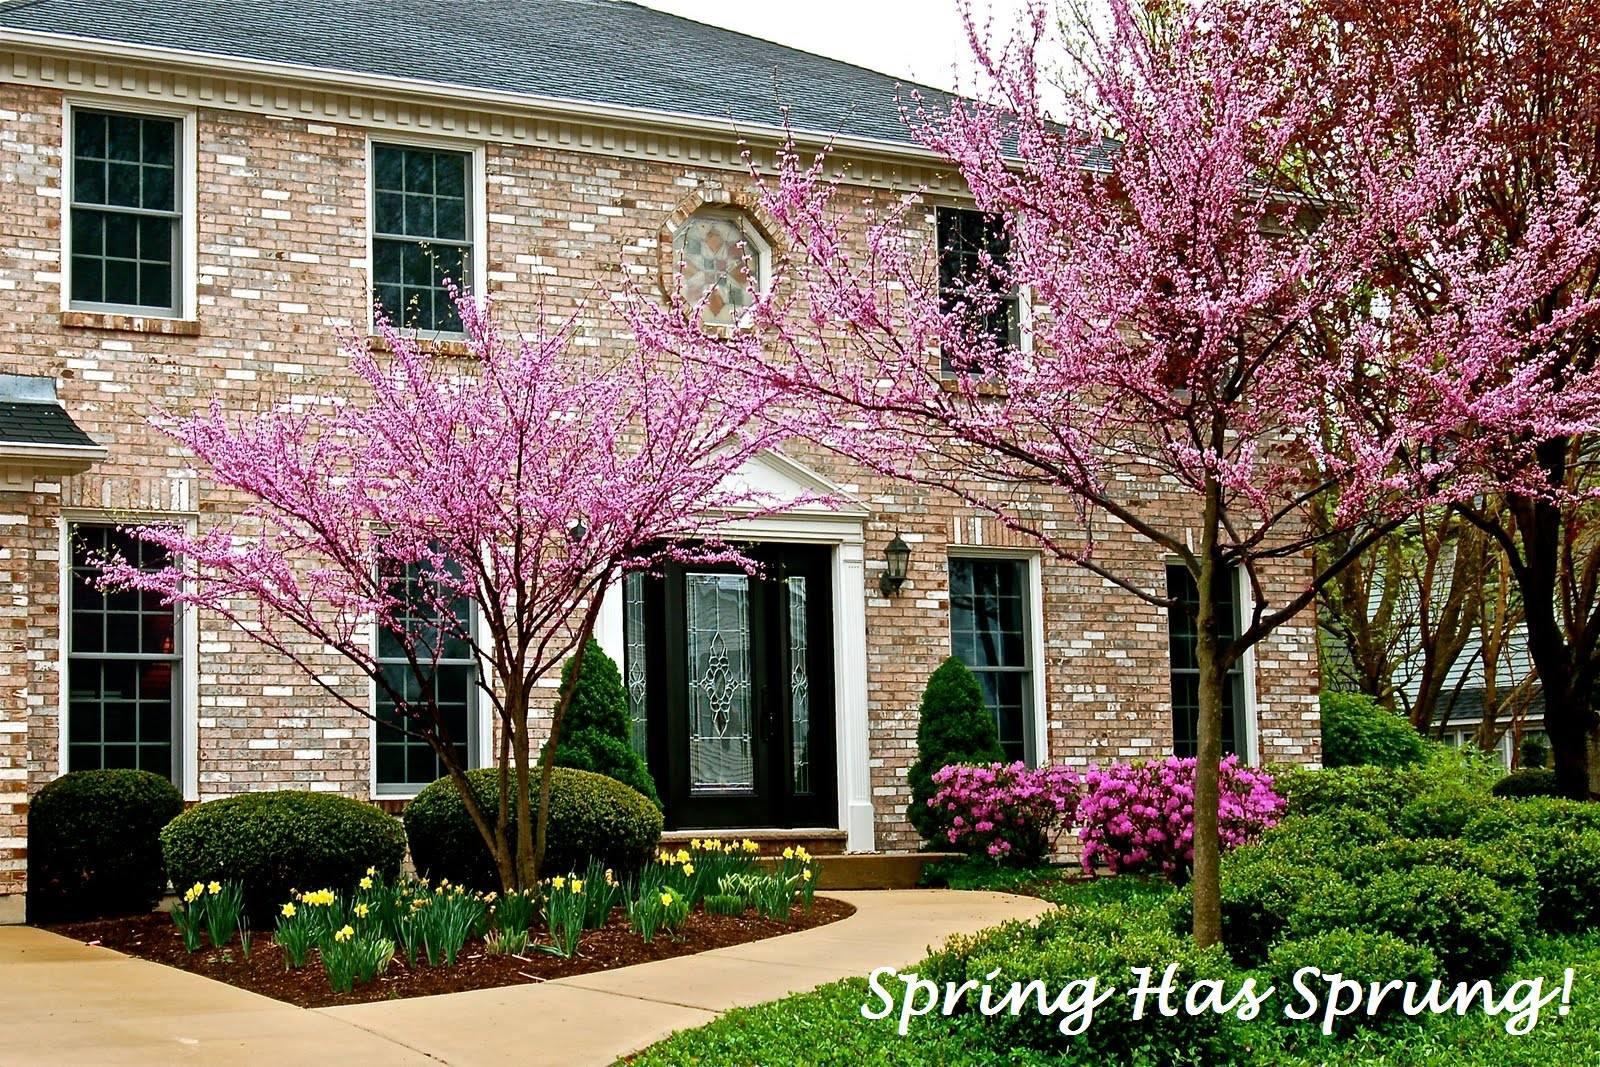 New Millennium Home Improvement Inc. image 2